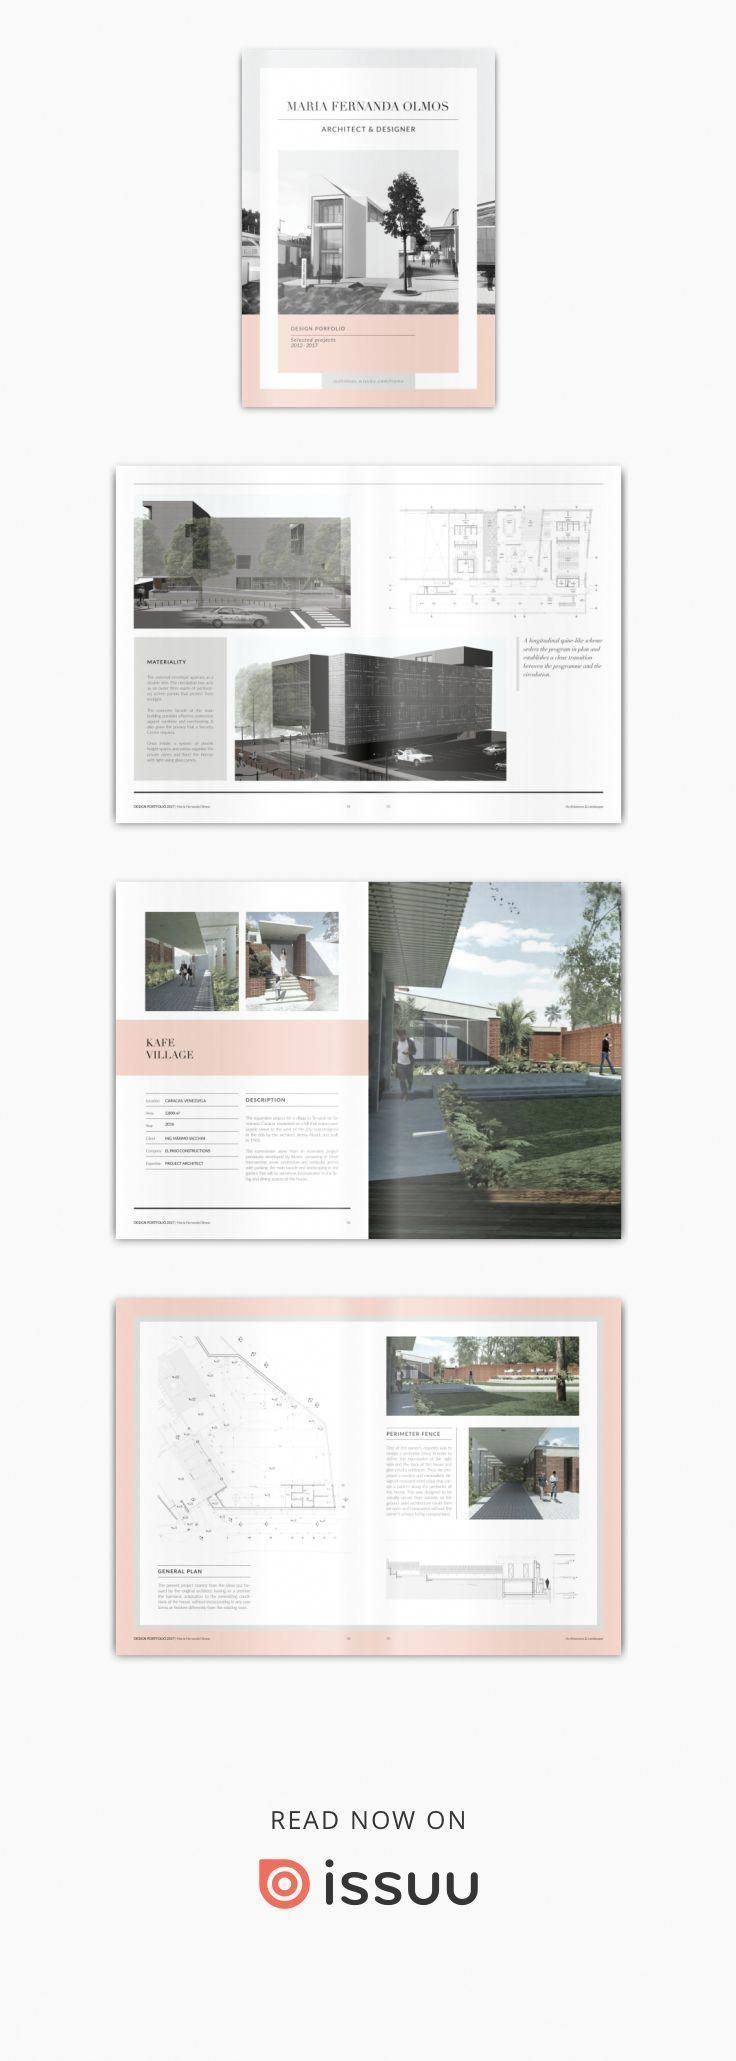 Interior design portfolio inspiration maria fernanda olmos architecture interiordesignportfolioinspiration also rh pinterest